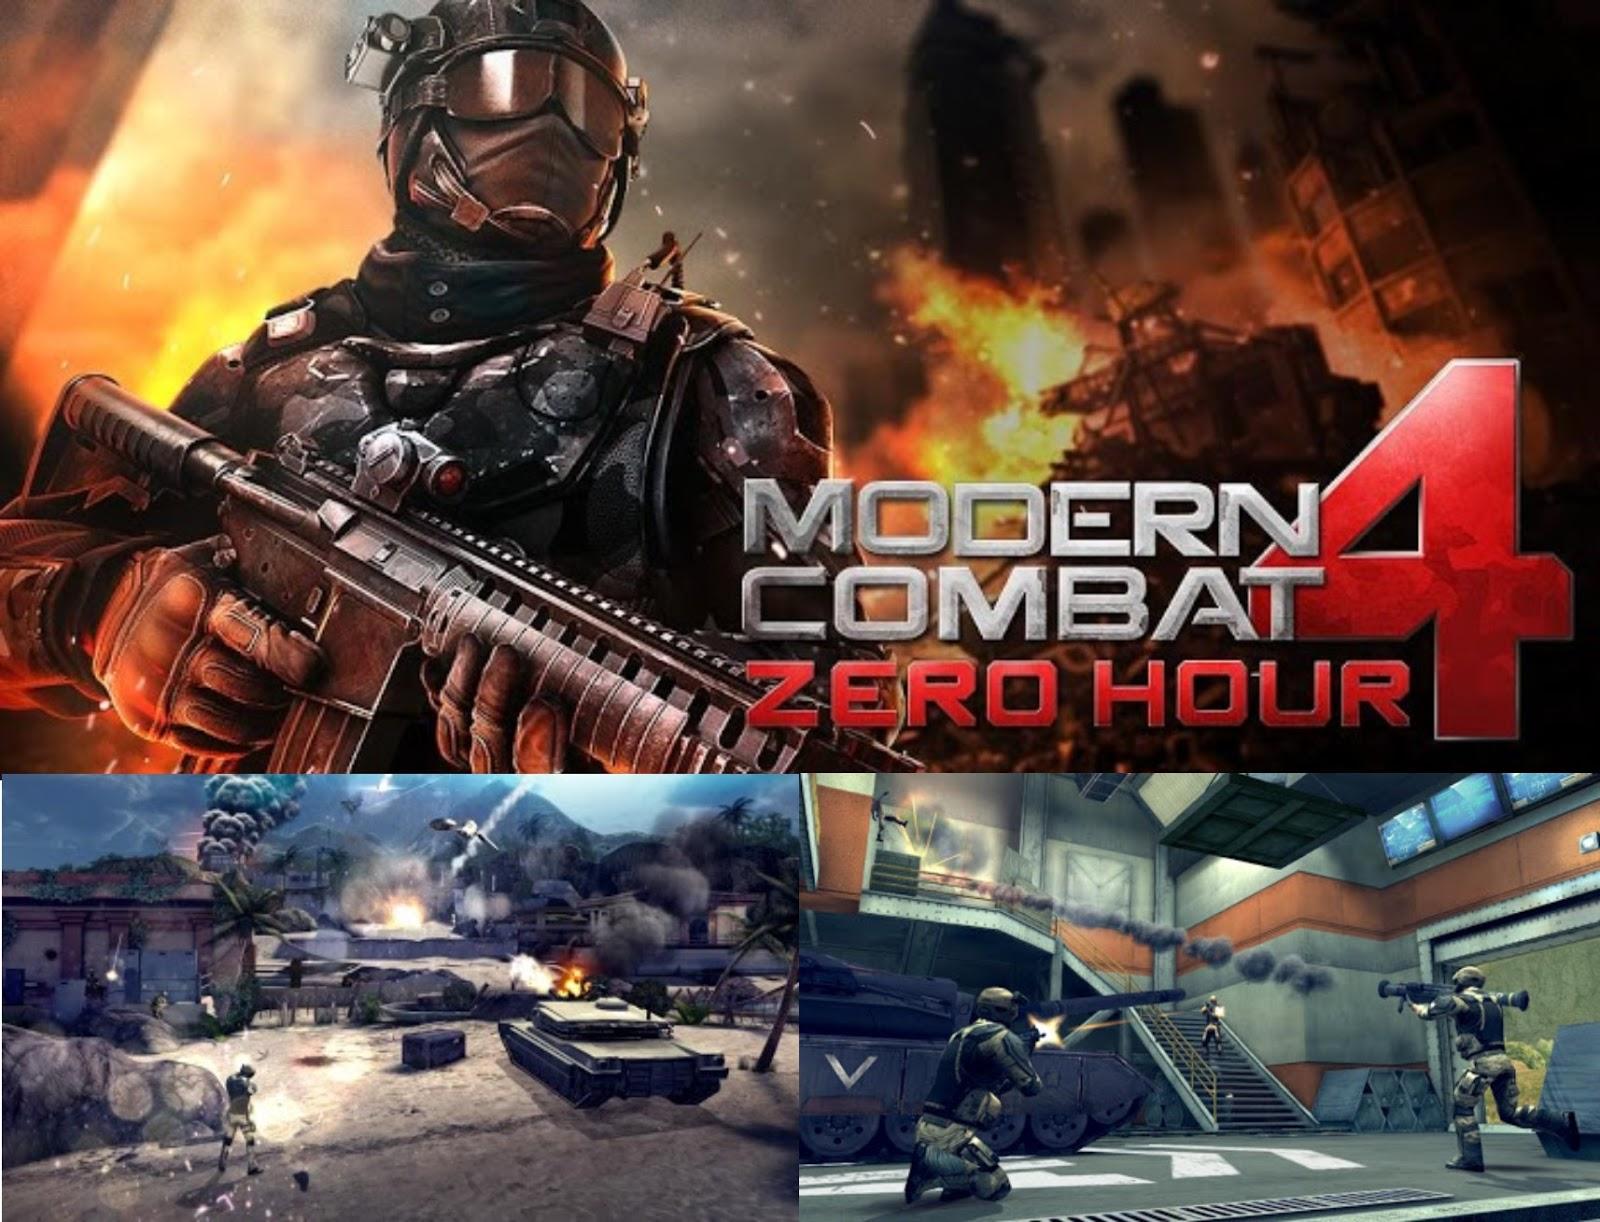 modern combat 4 zero hour v1 0 1 apk sd data android